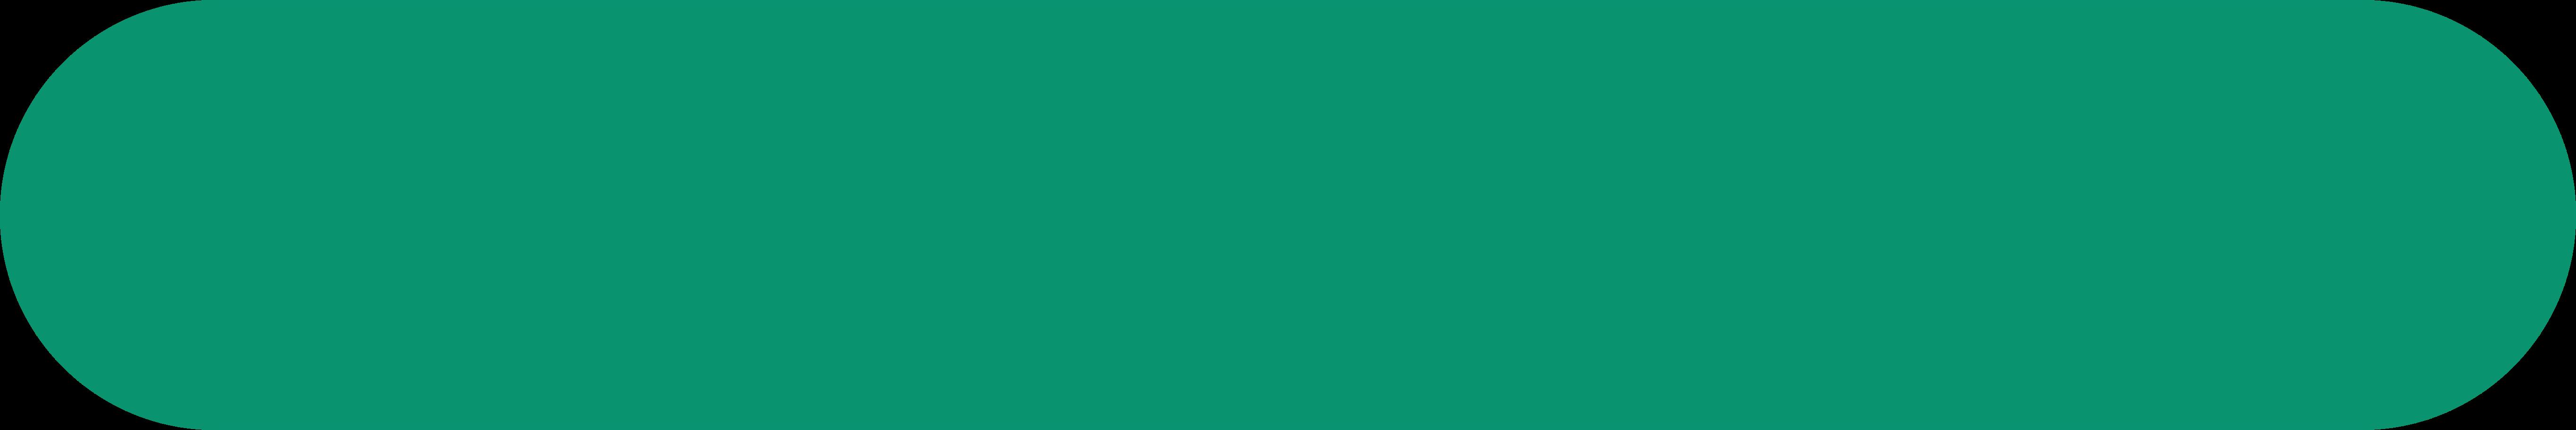 indicator Clipart illustration in PNG, SVG